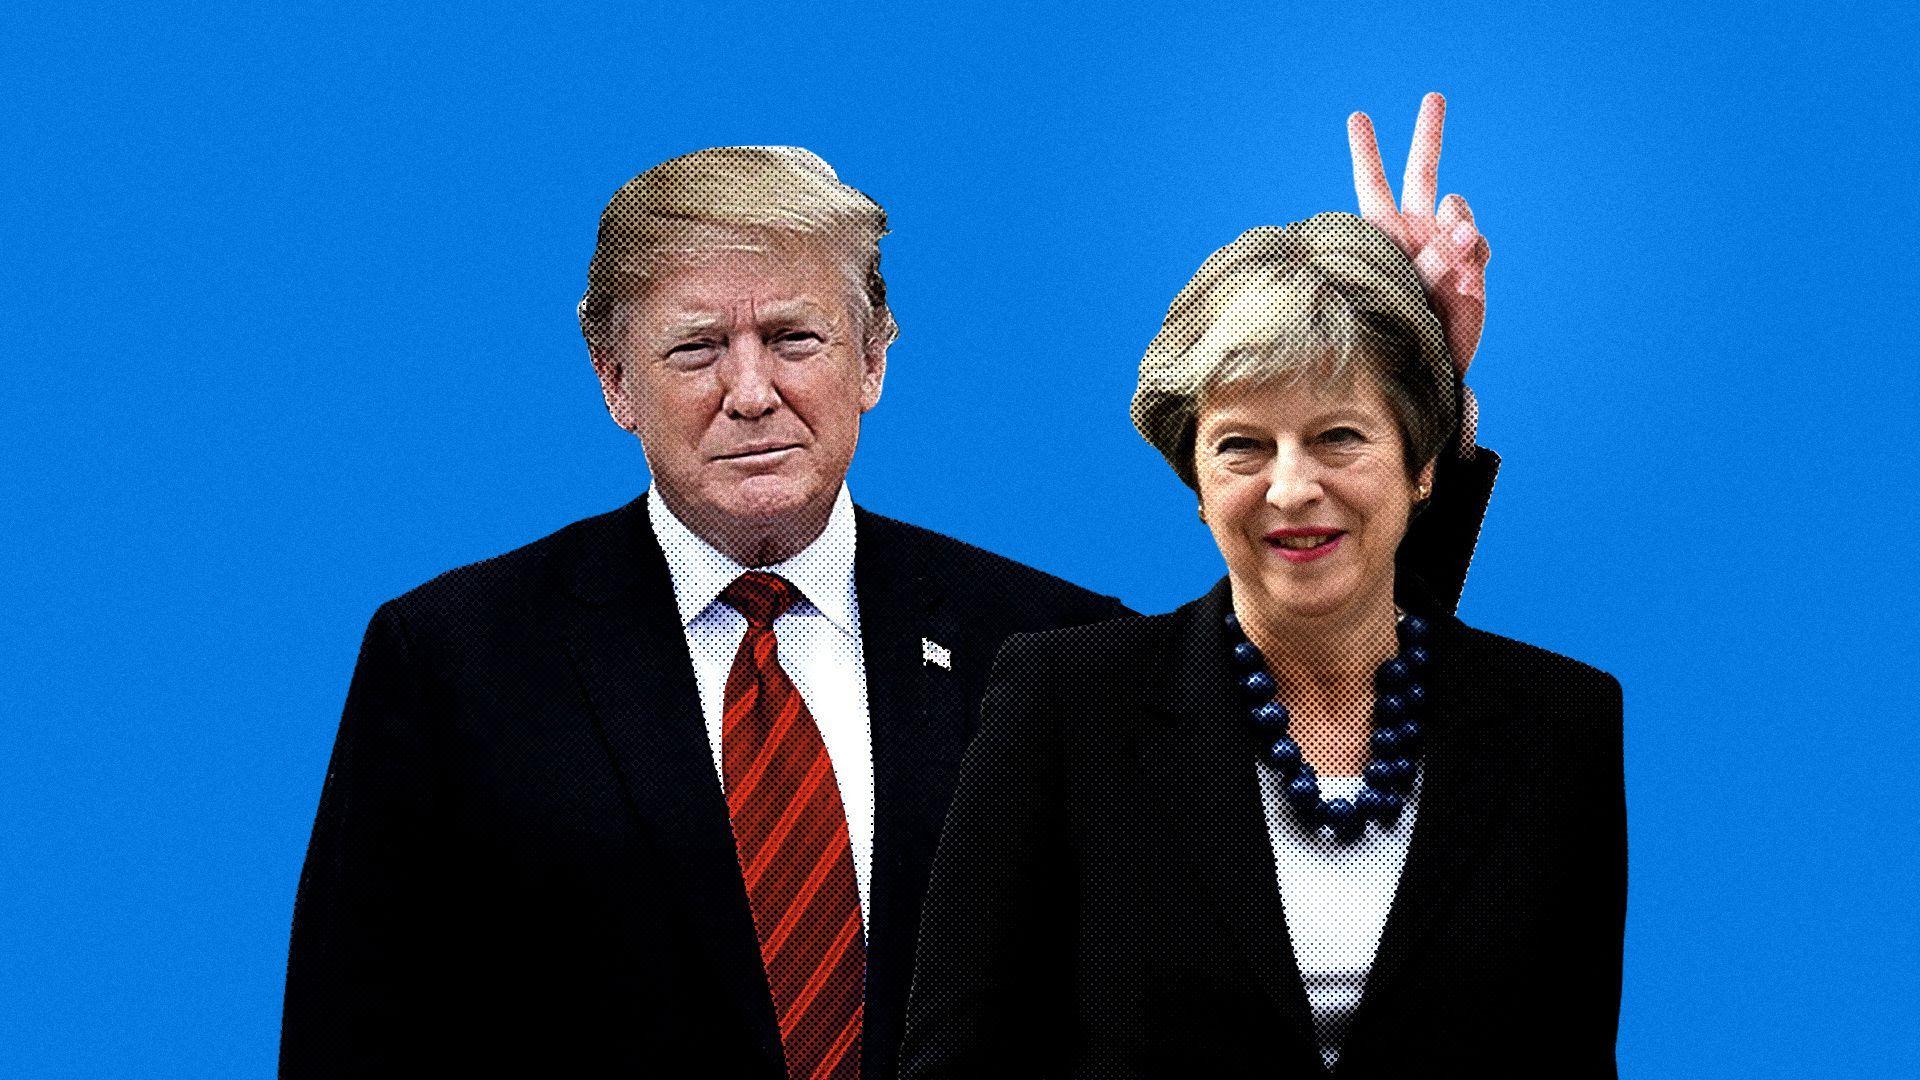 Illustration of Trump making a peace sign behind Theresa May's head